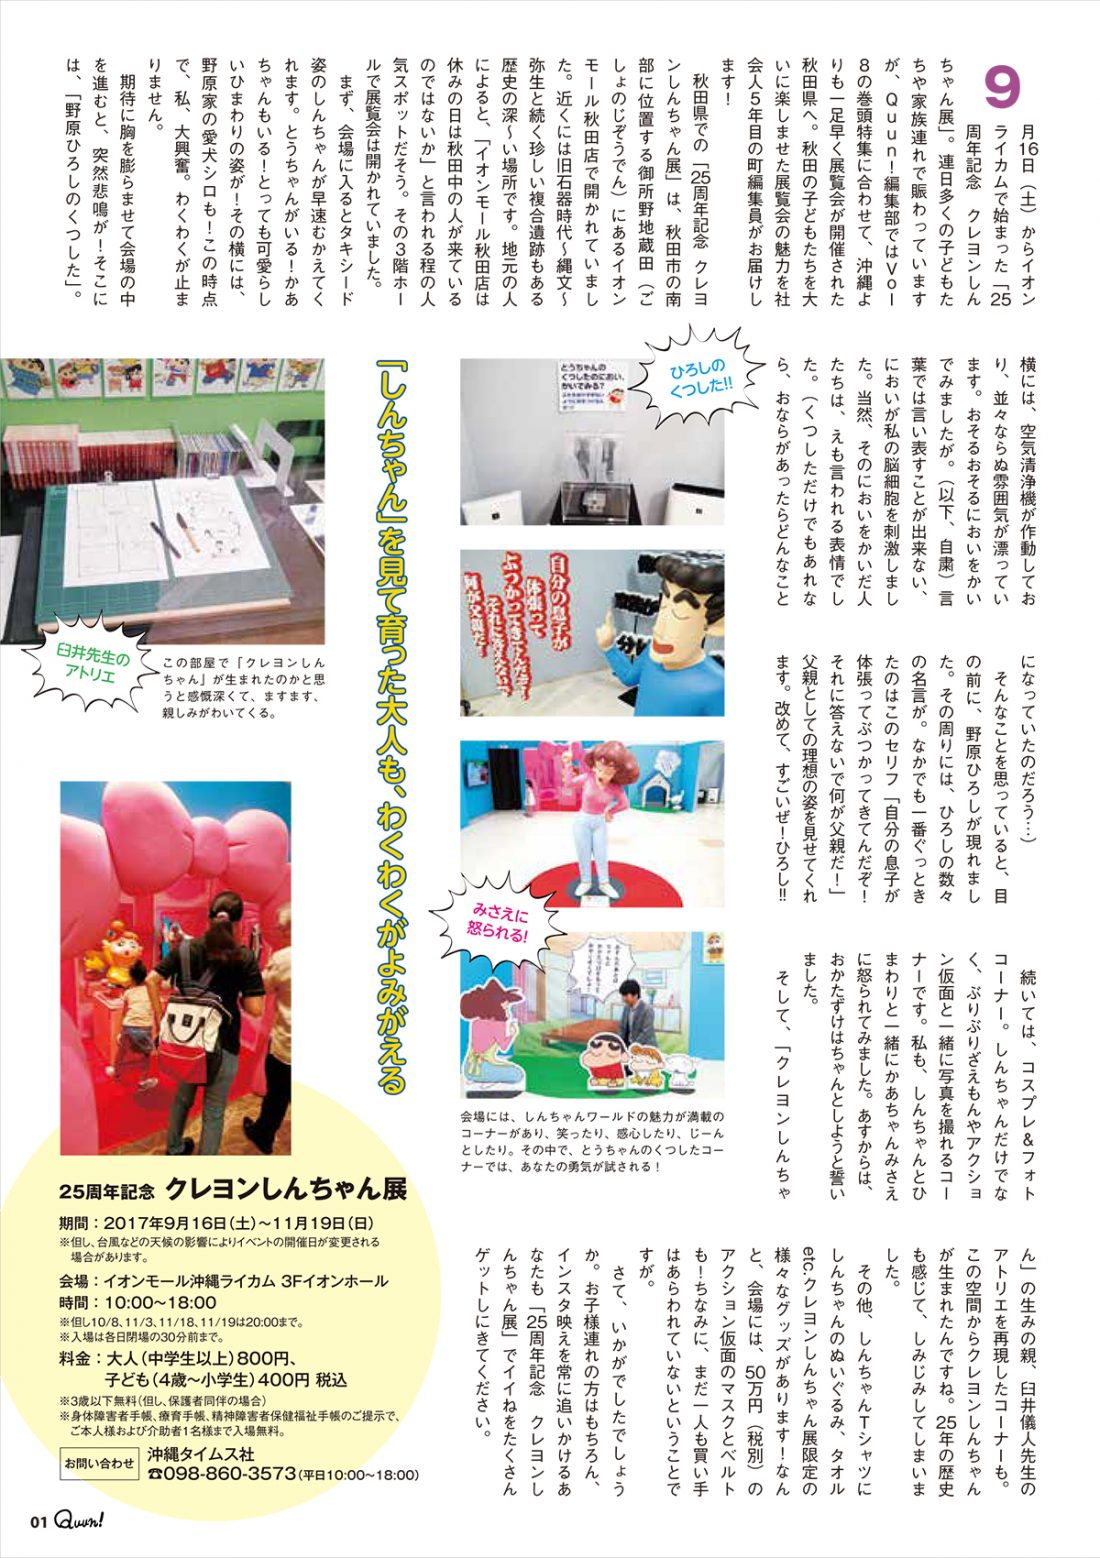 http://www.qab.co.jp/qgoro/wp-content/uploads/quun_0803-1100x1558.jpg